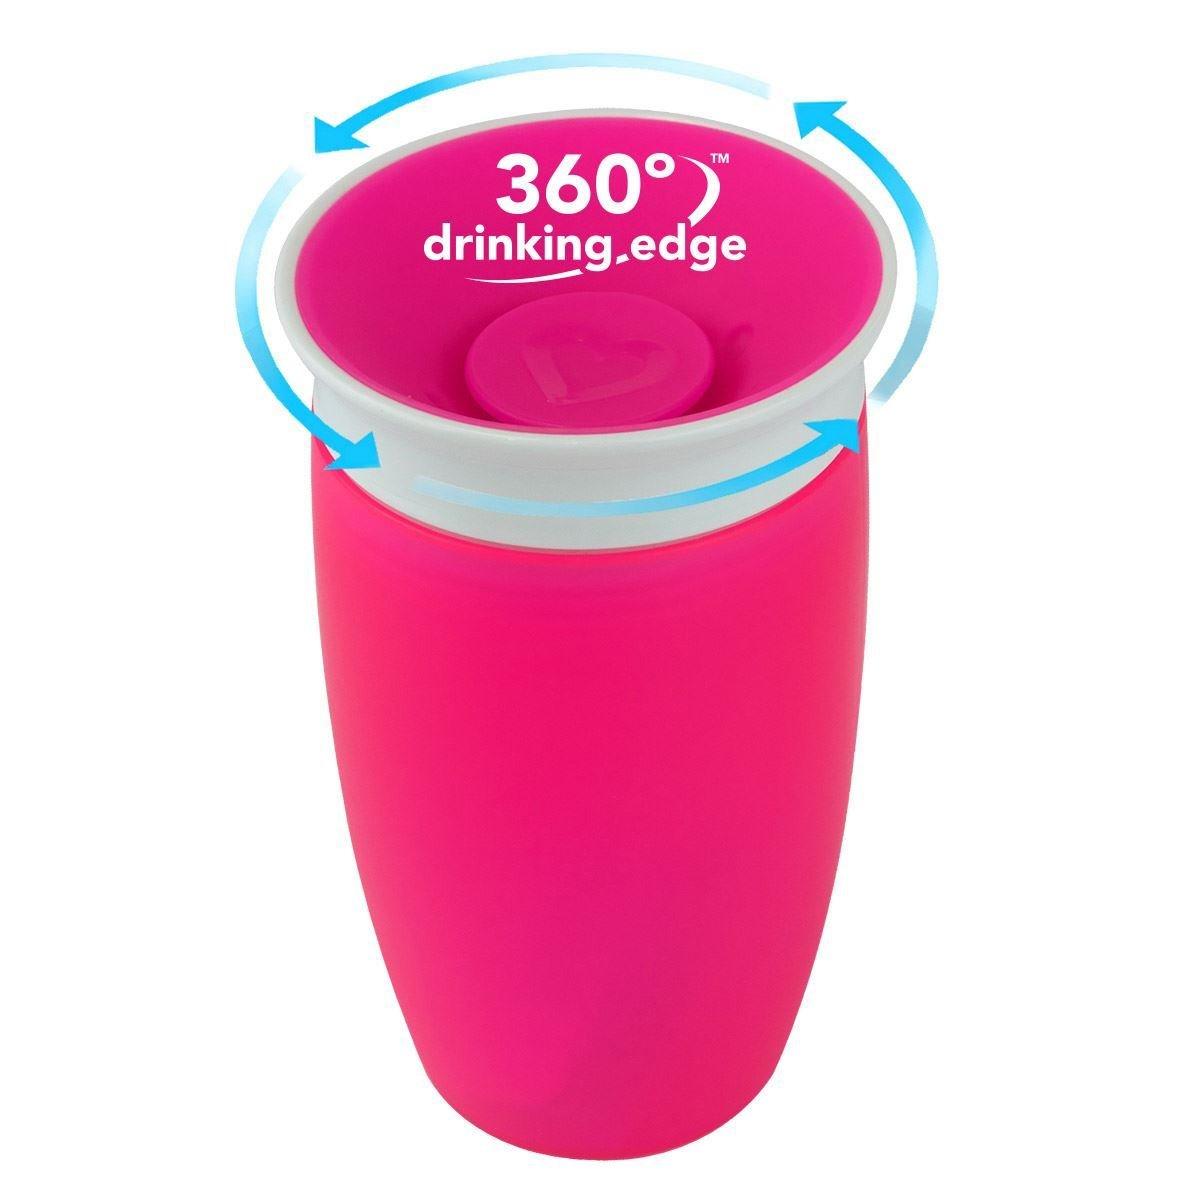 Munchkin Sippy Cup Παιδικό Κύπελλο Miracle 360° 12m+, 296ml – φούξια